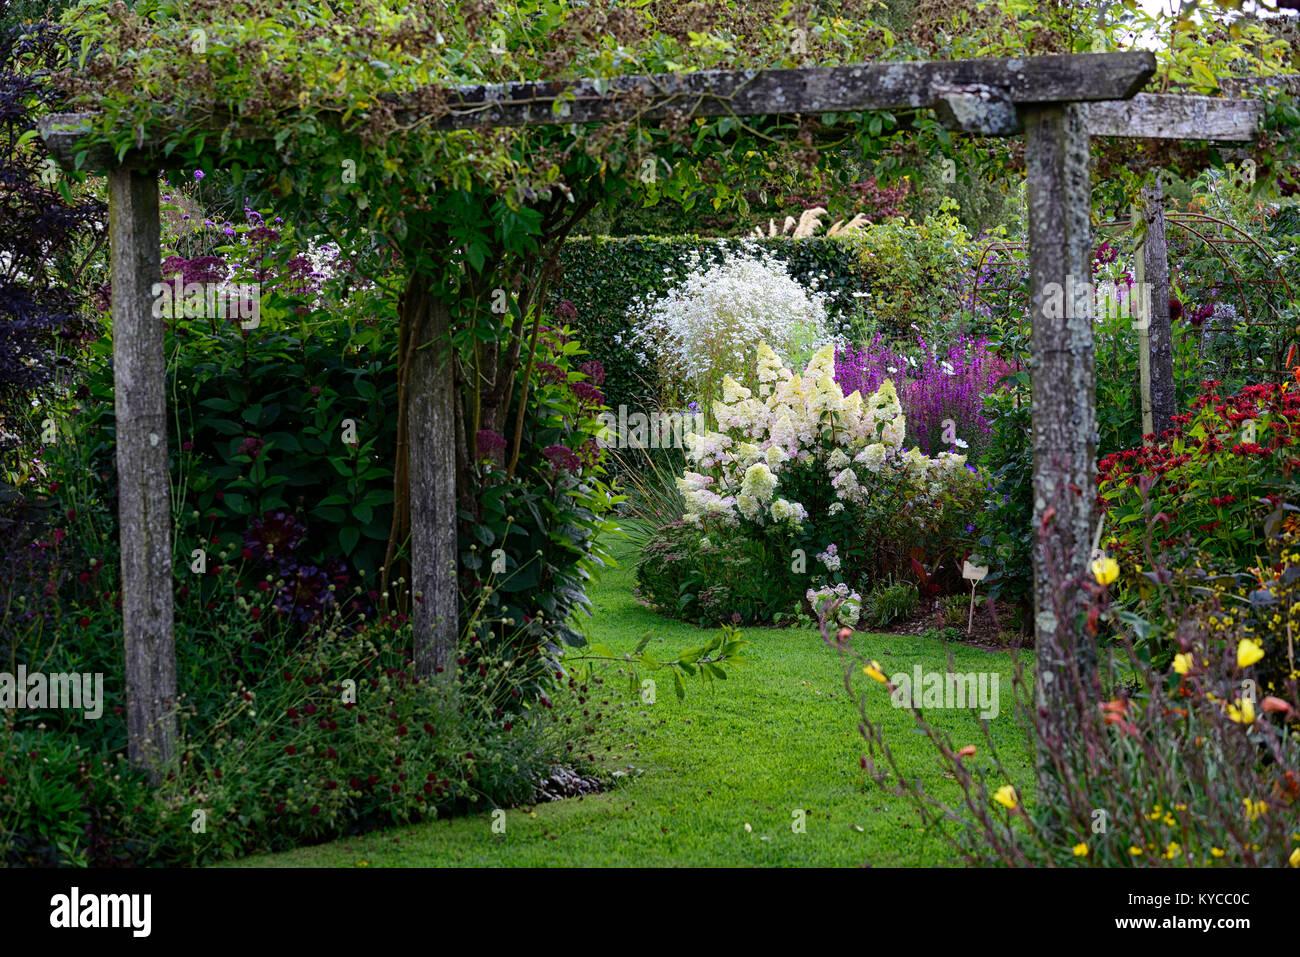 Wood,wooden,arbor,pergola,garden,entrance,separation,separating,